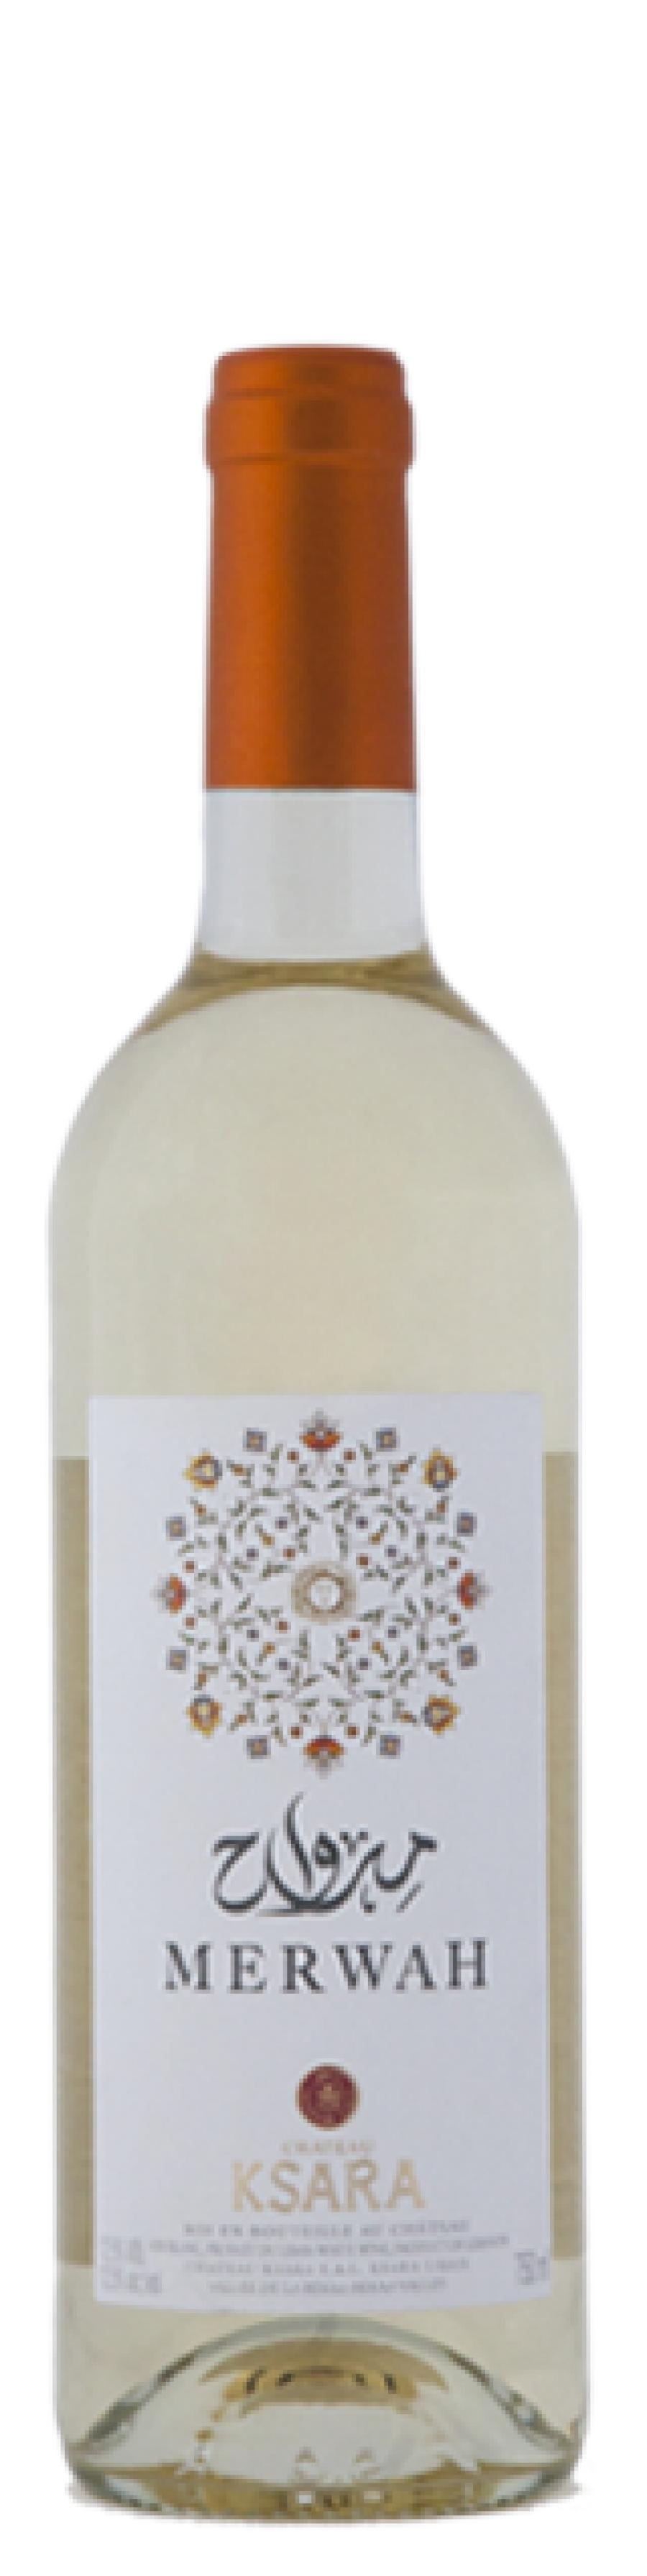 Merwah - Vino bianco libanese